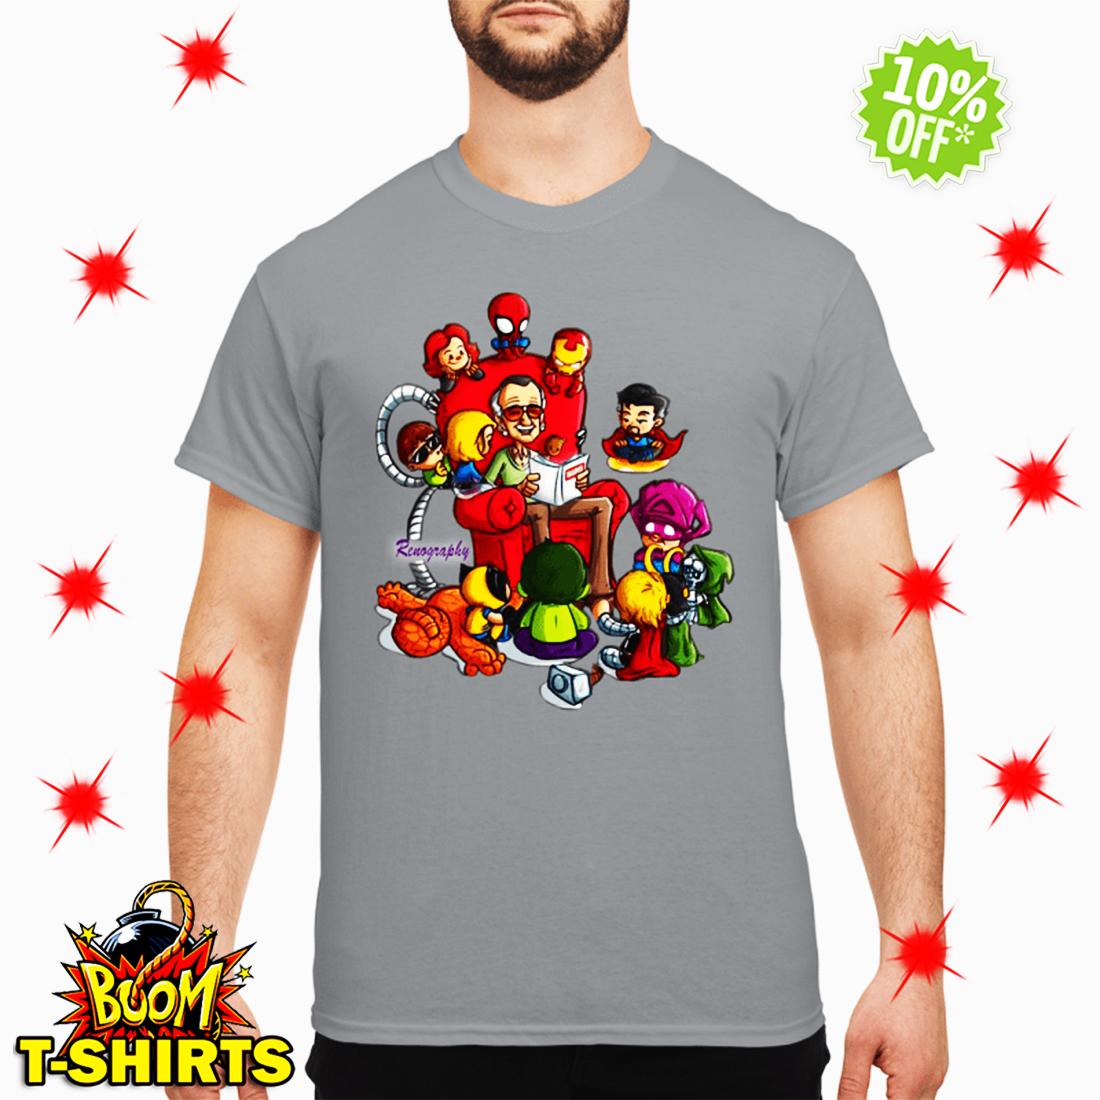 Stan Lee Marvel and Superhero Renography shirt